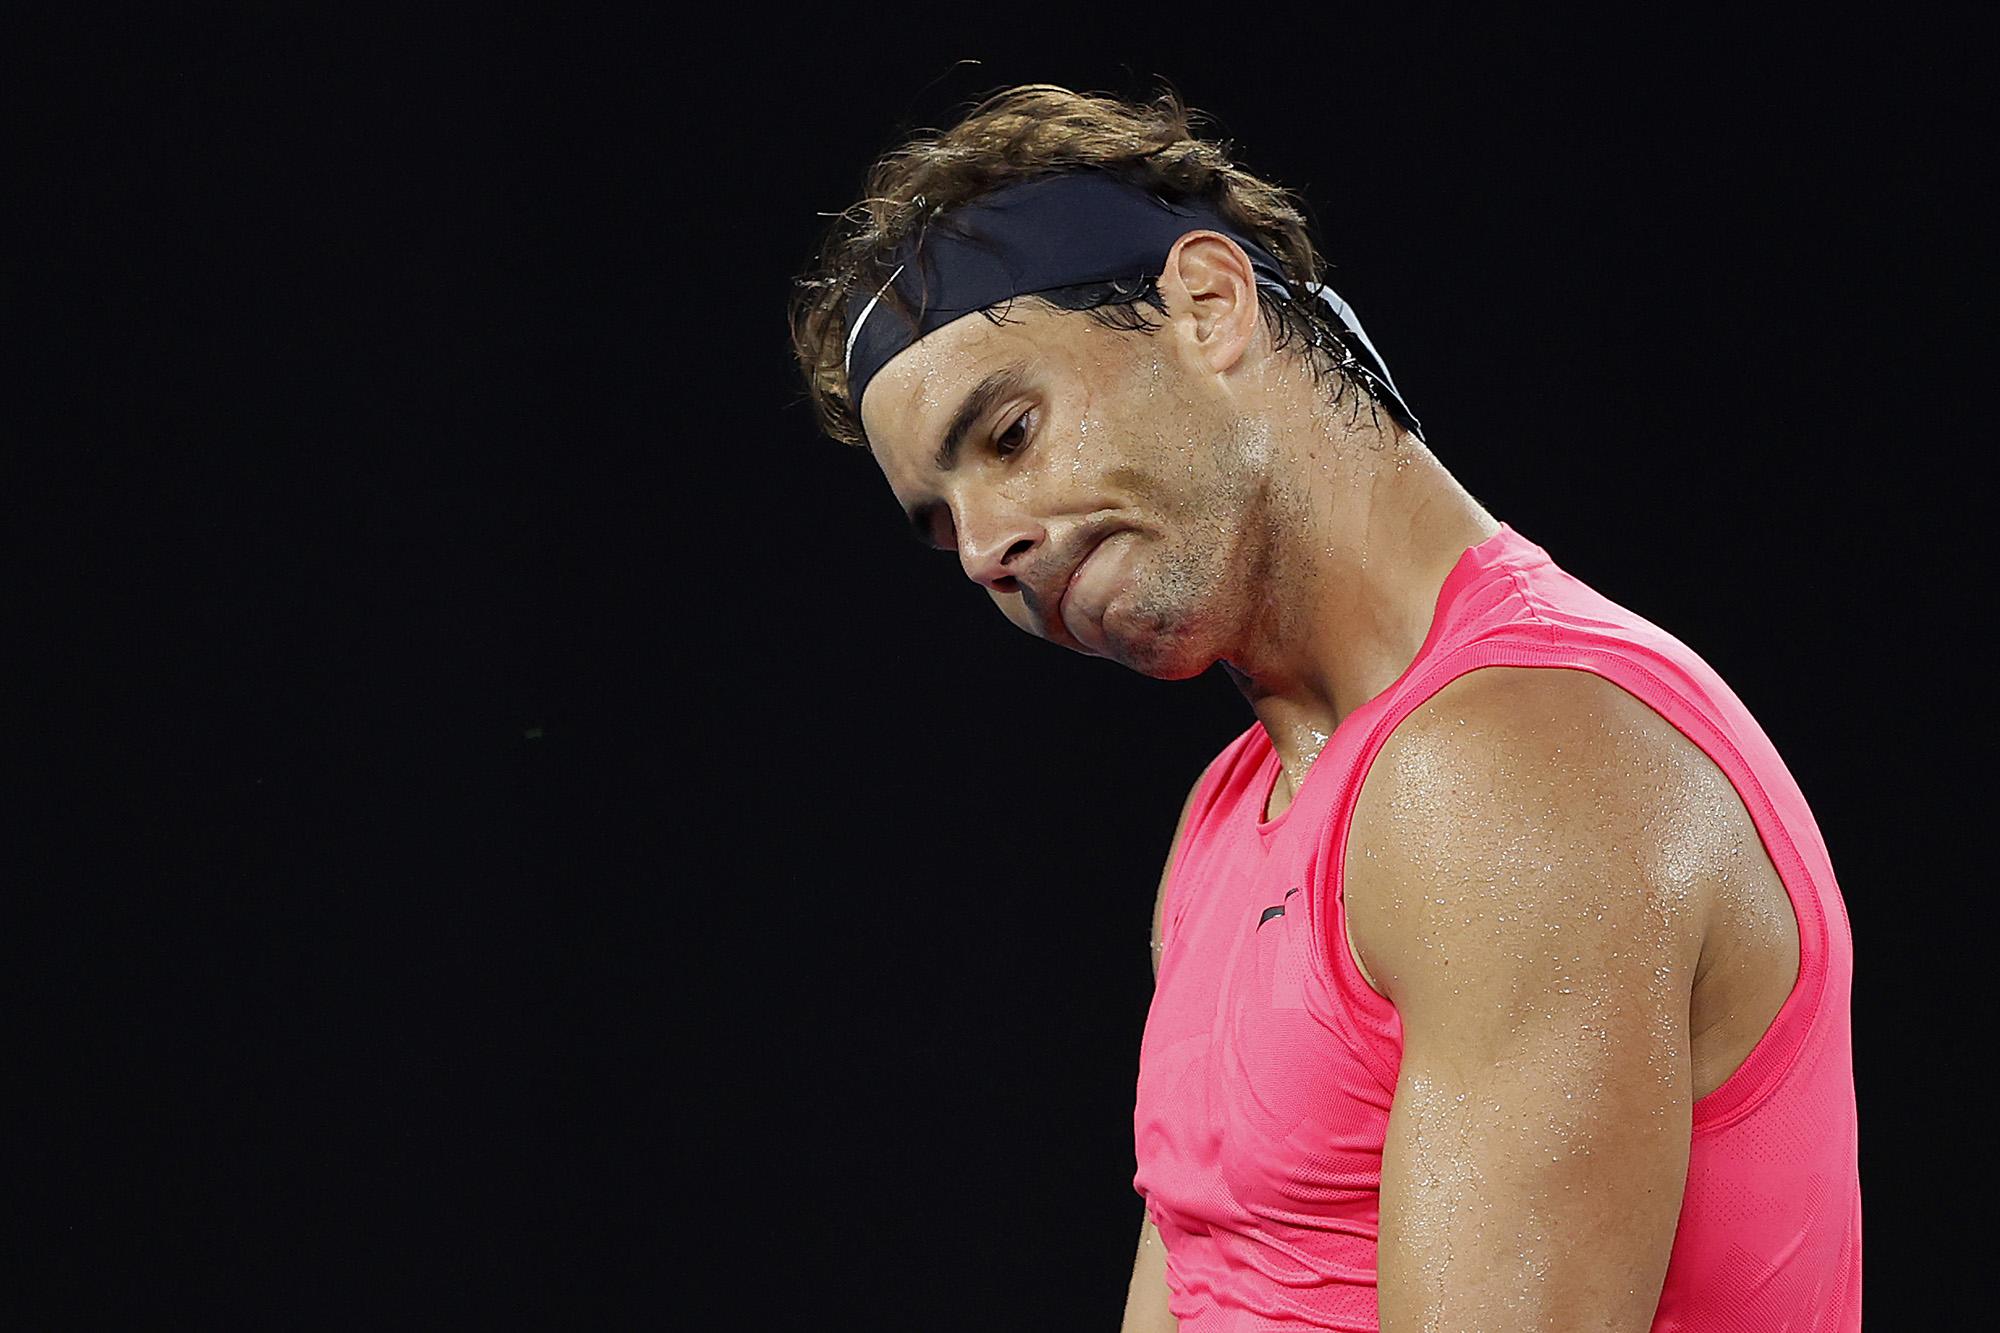 Rafael Nadal Is Ready To Sacrifice The Entire 2020 Tennis Season